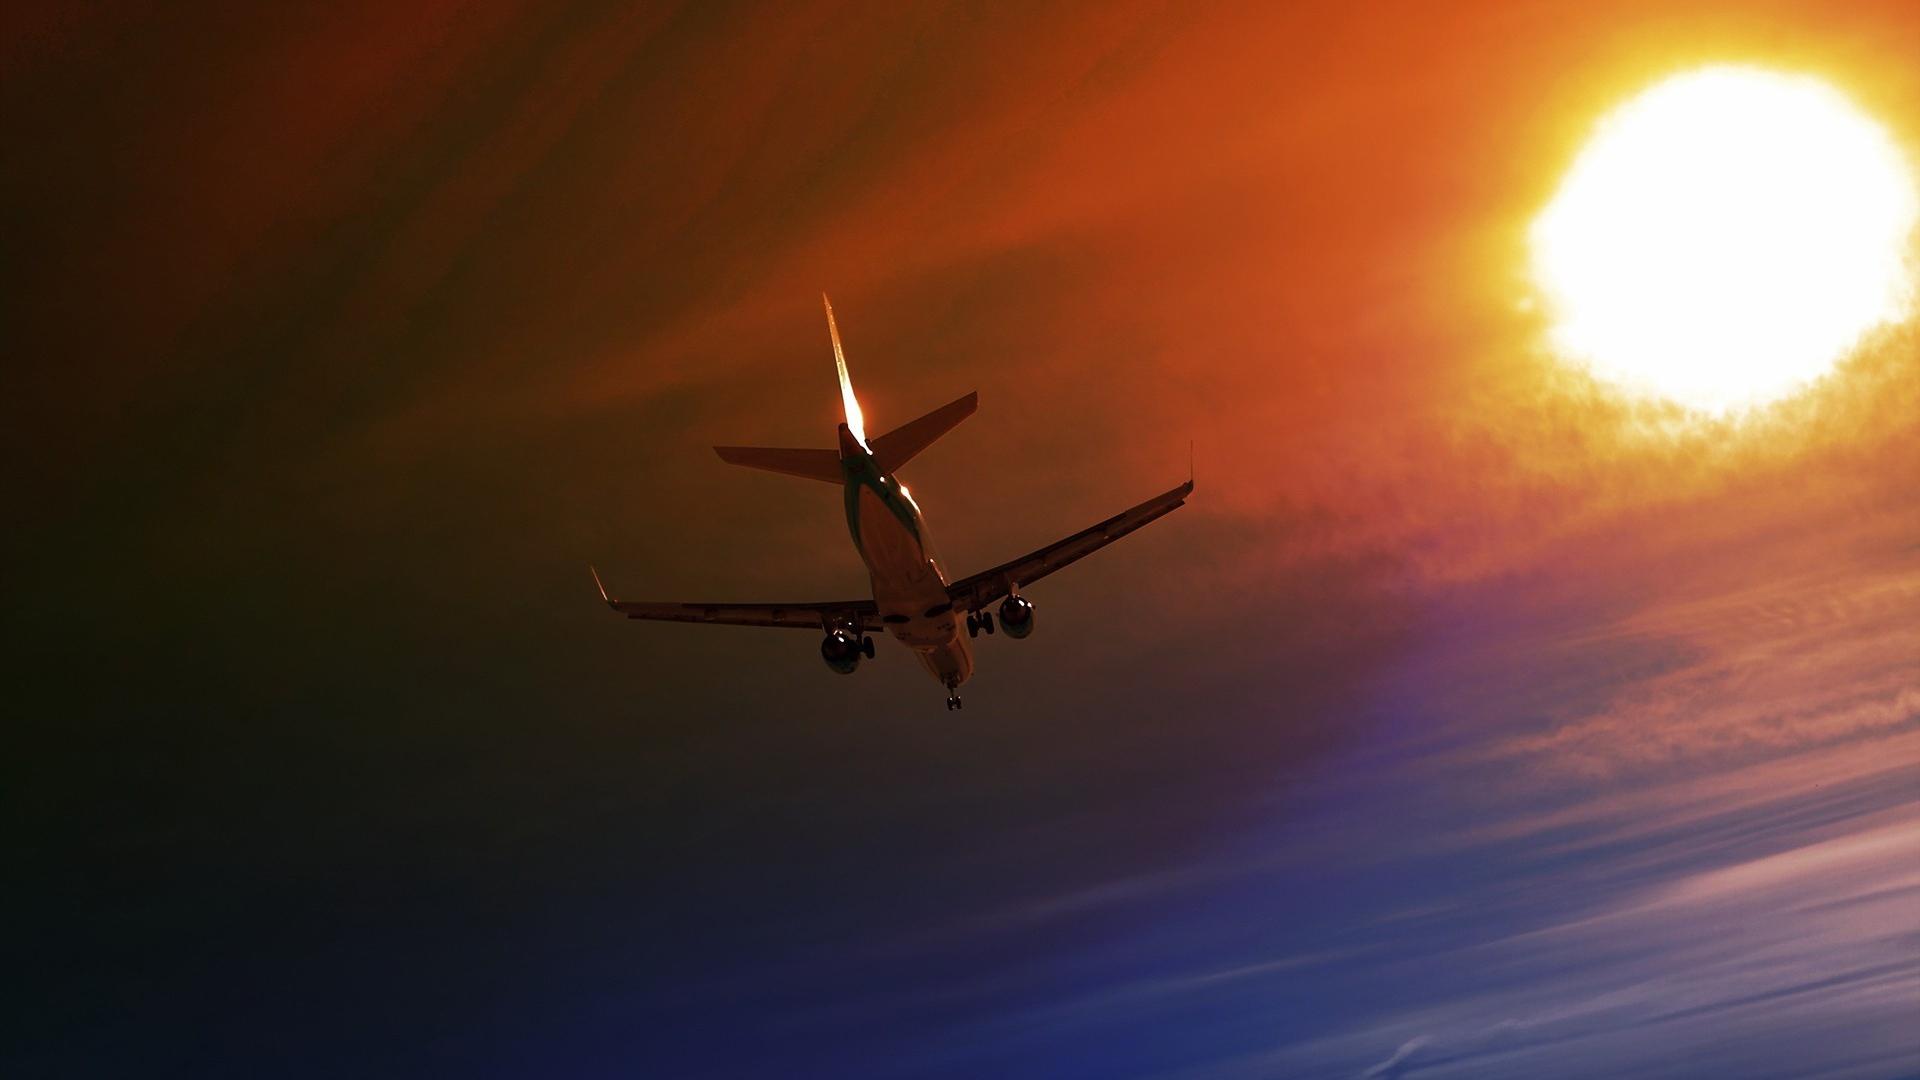 Best Wallpaper Night Airplane - plane_sky_night_flight_64608_1920x1080  Snapshot.jpg